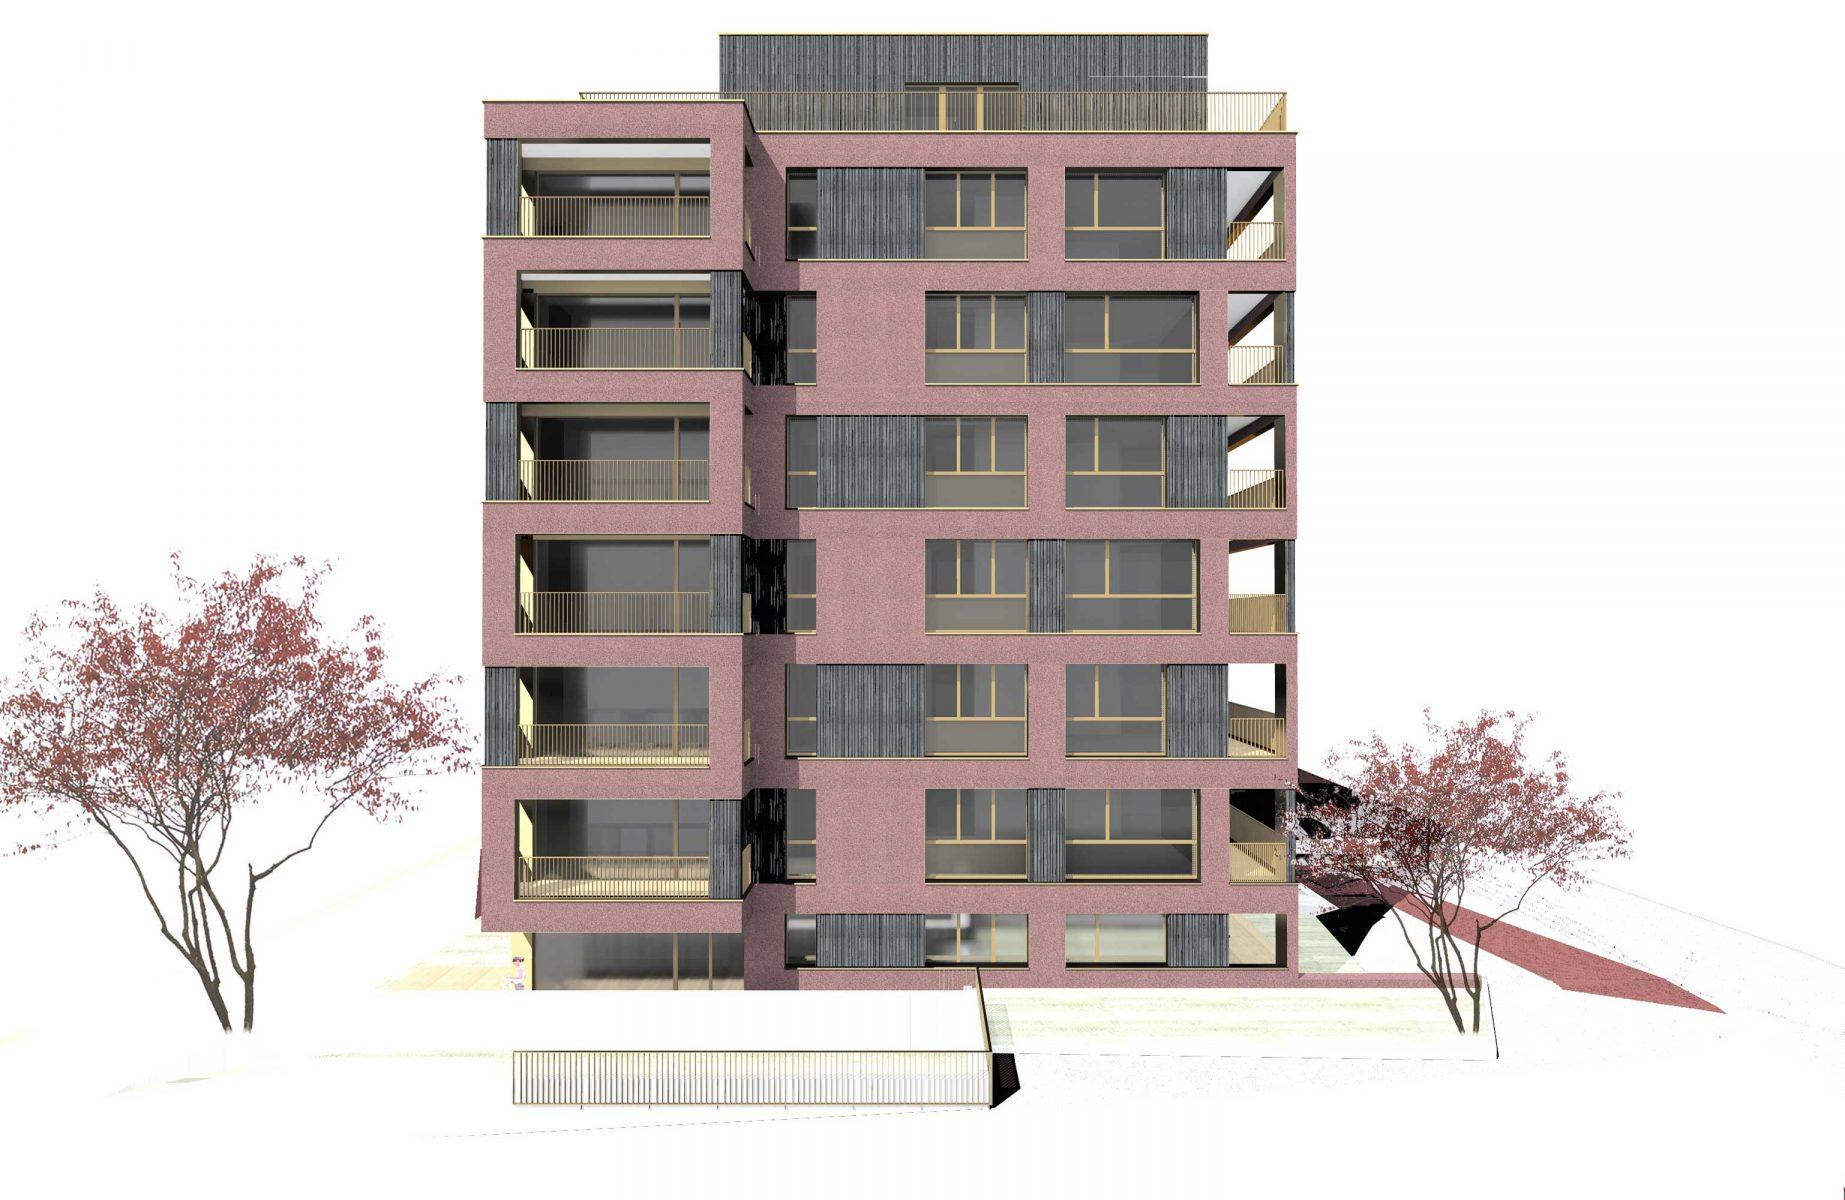 sous-bois-facade-n.e.bois-BOIS-NOIR